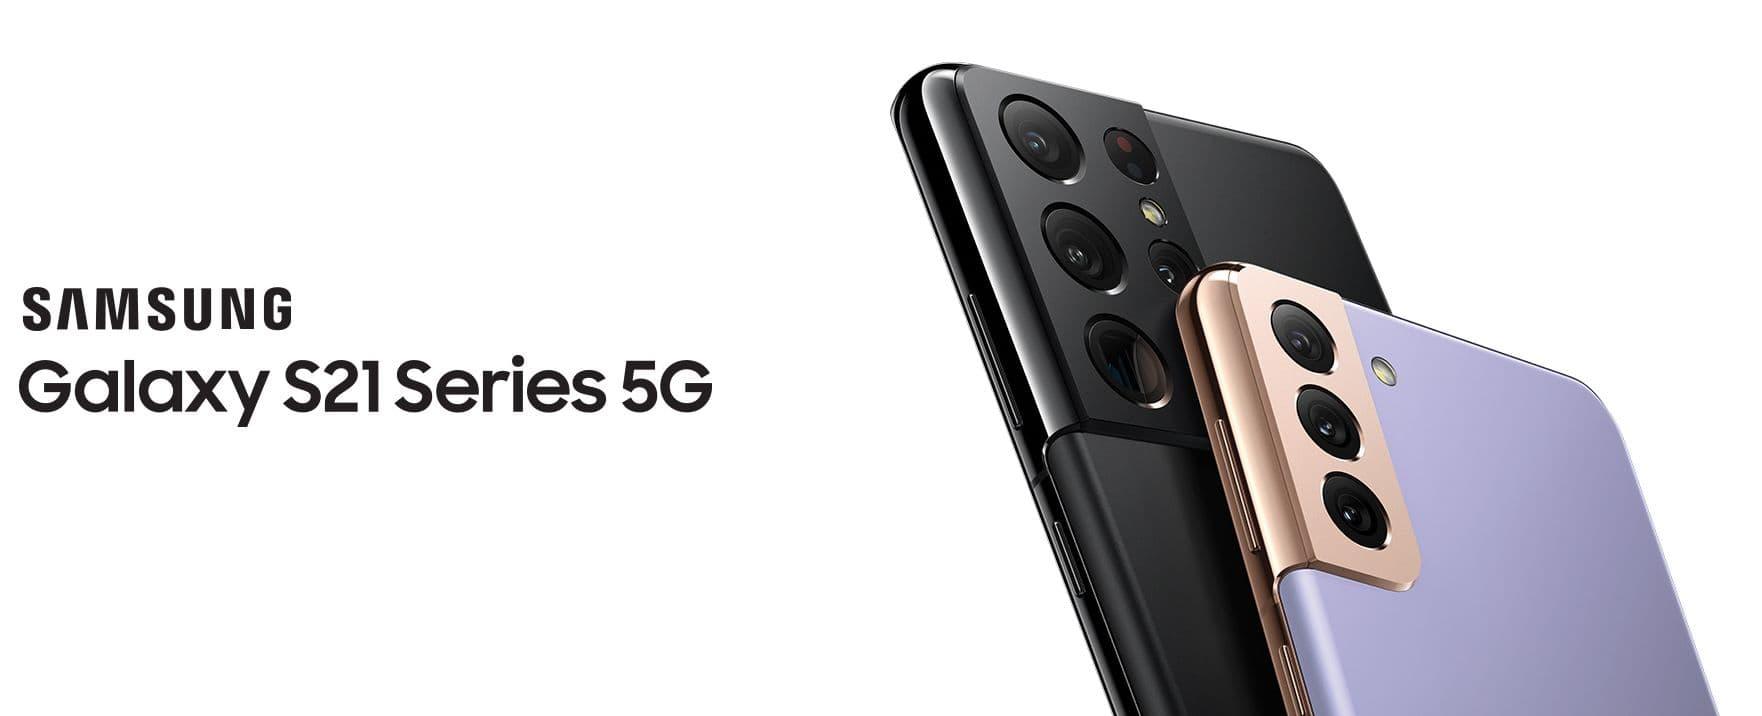 Samsung-Galaxy-S21-series-5G